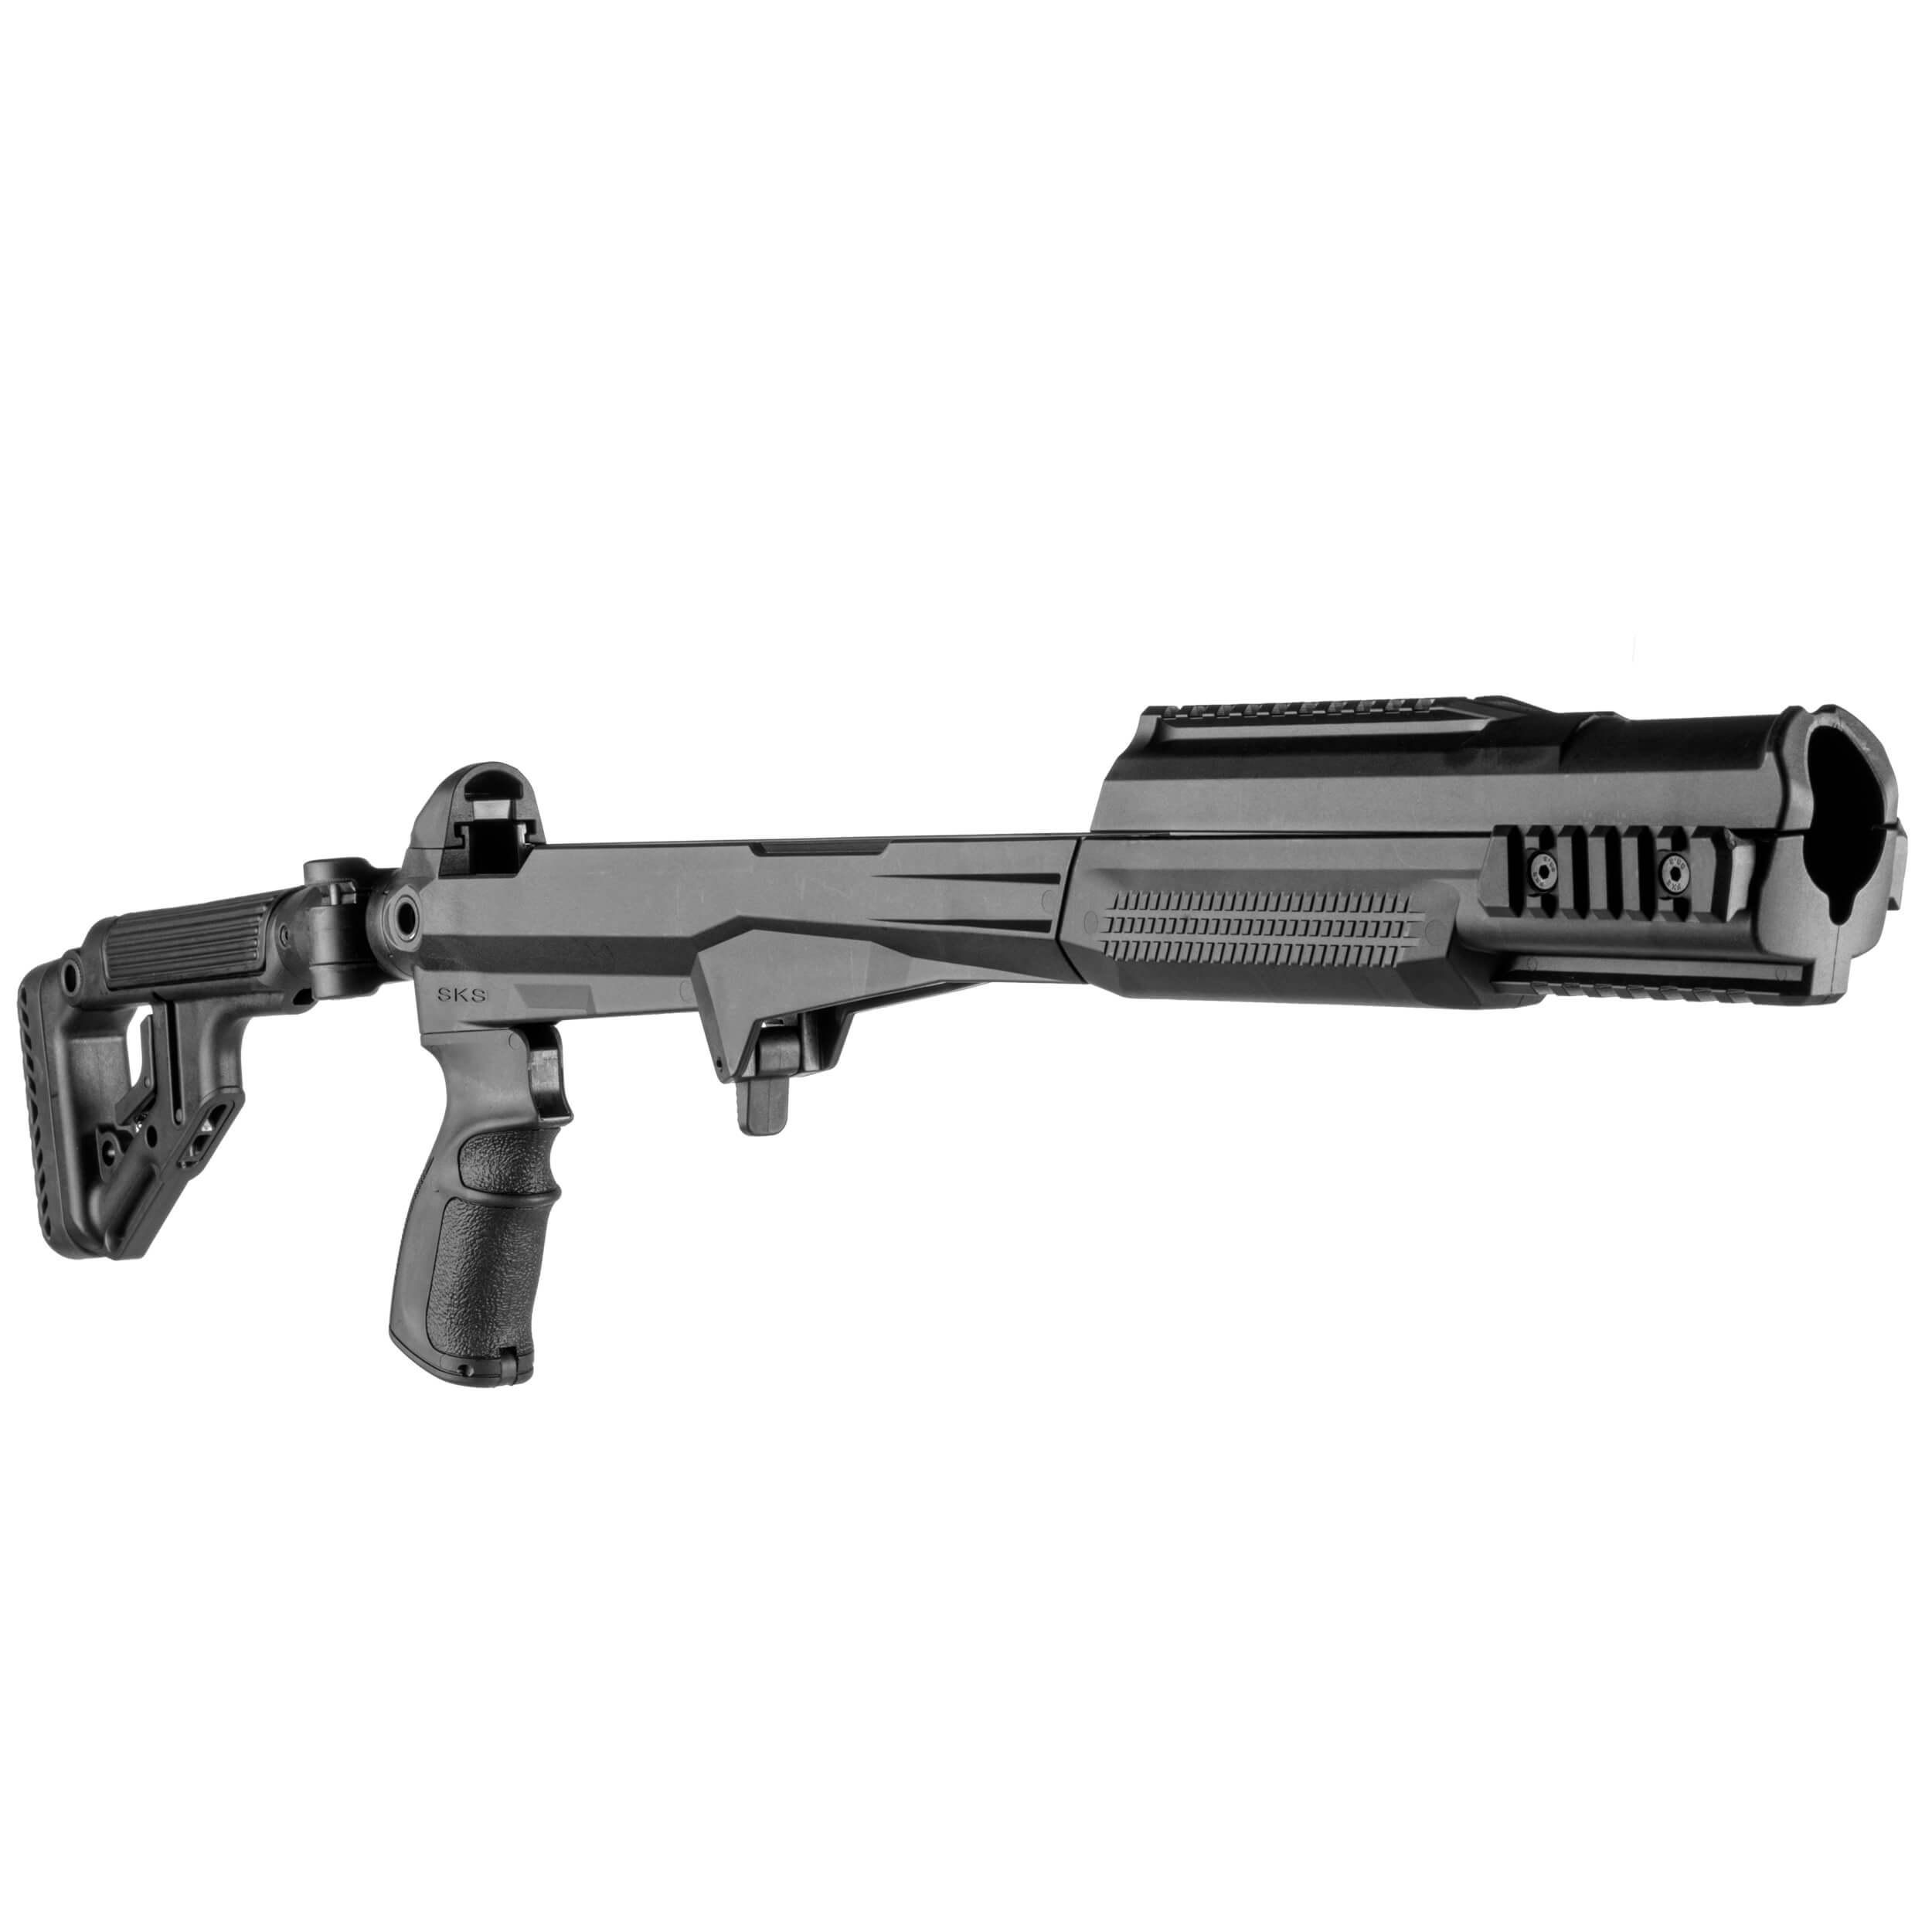 starshooter ak 47 pistolengriff saw m249 style schwarz tapco online kaufen. Black Bedroom Furniture Sets. Home Design Ideas